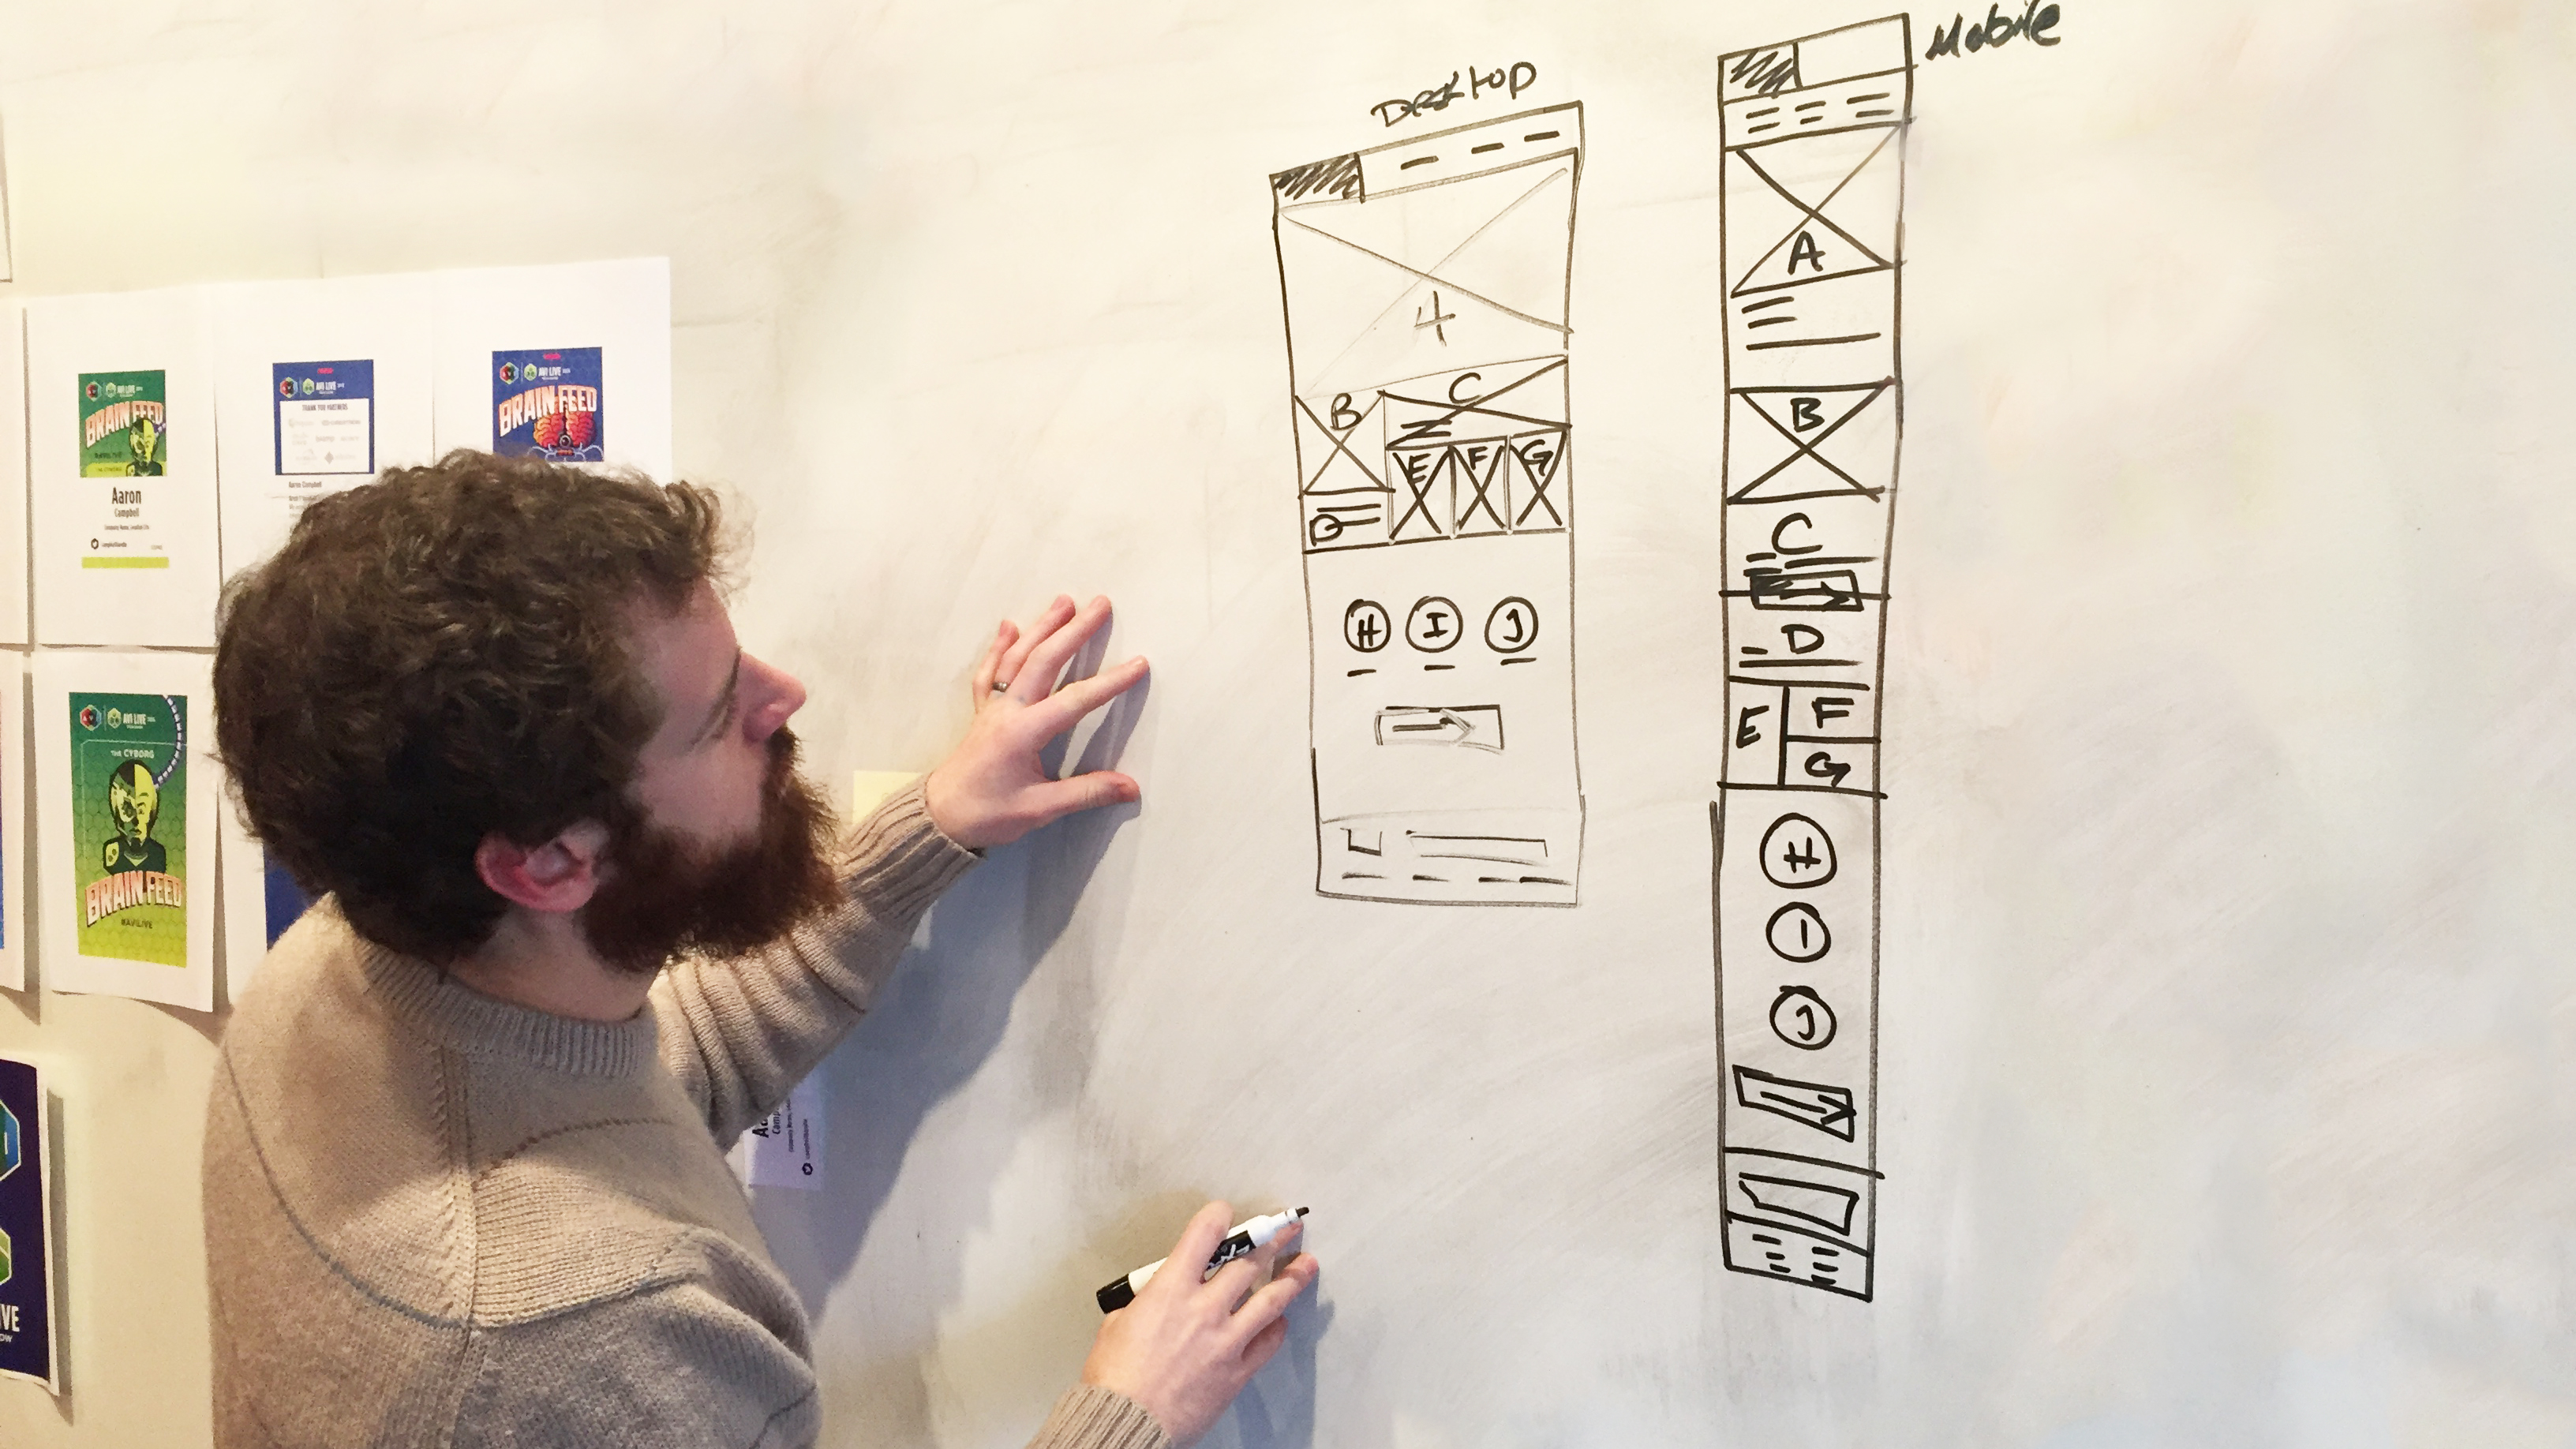 Designer sketching website wireframes on whiteboard